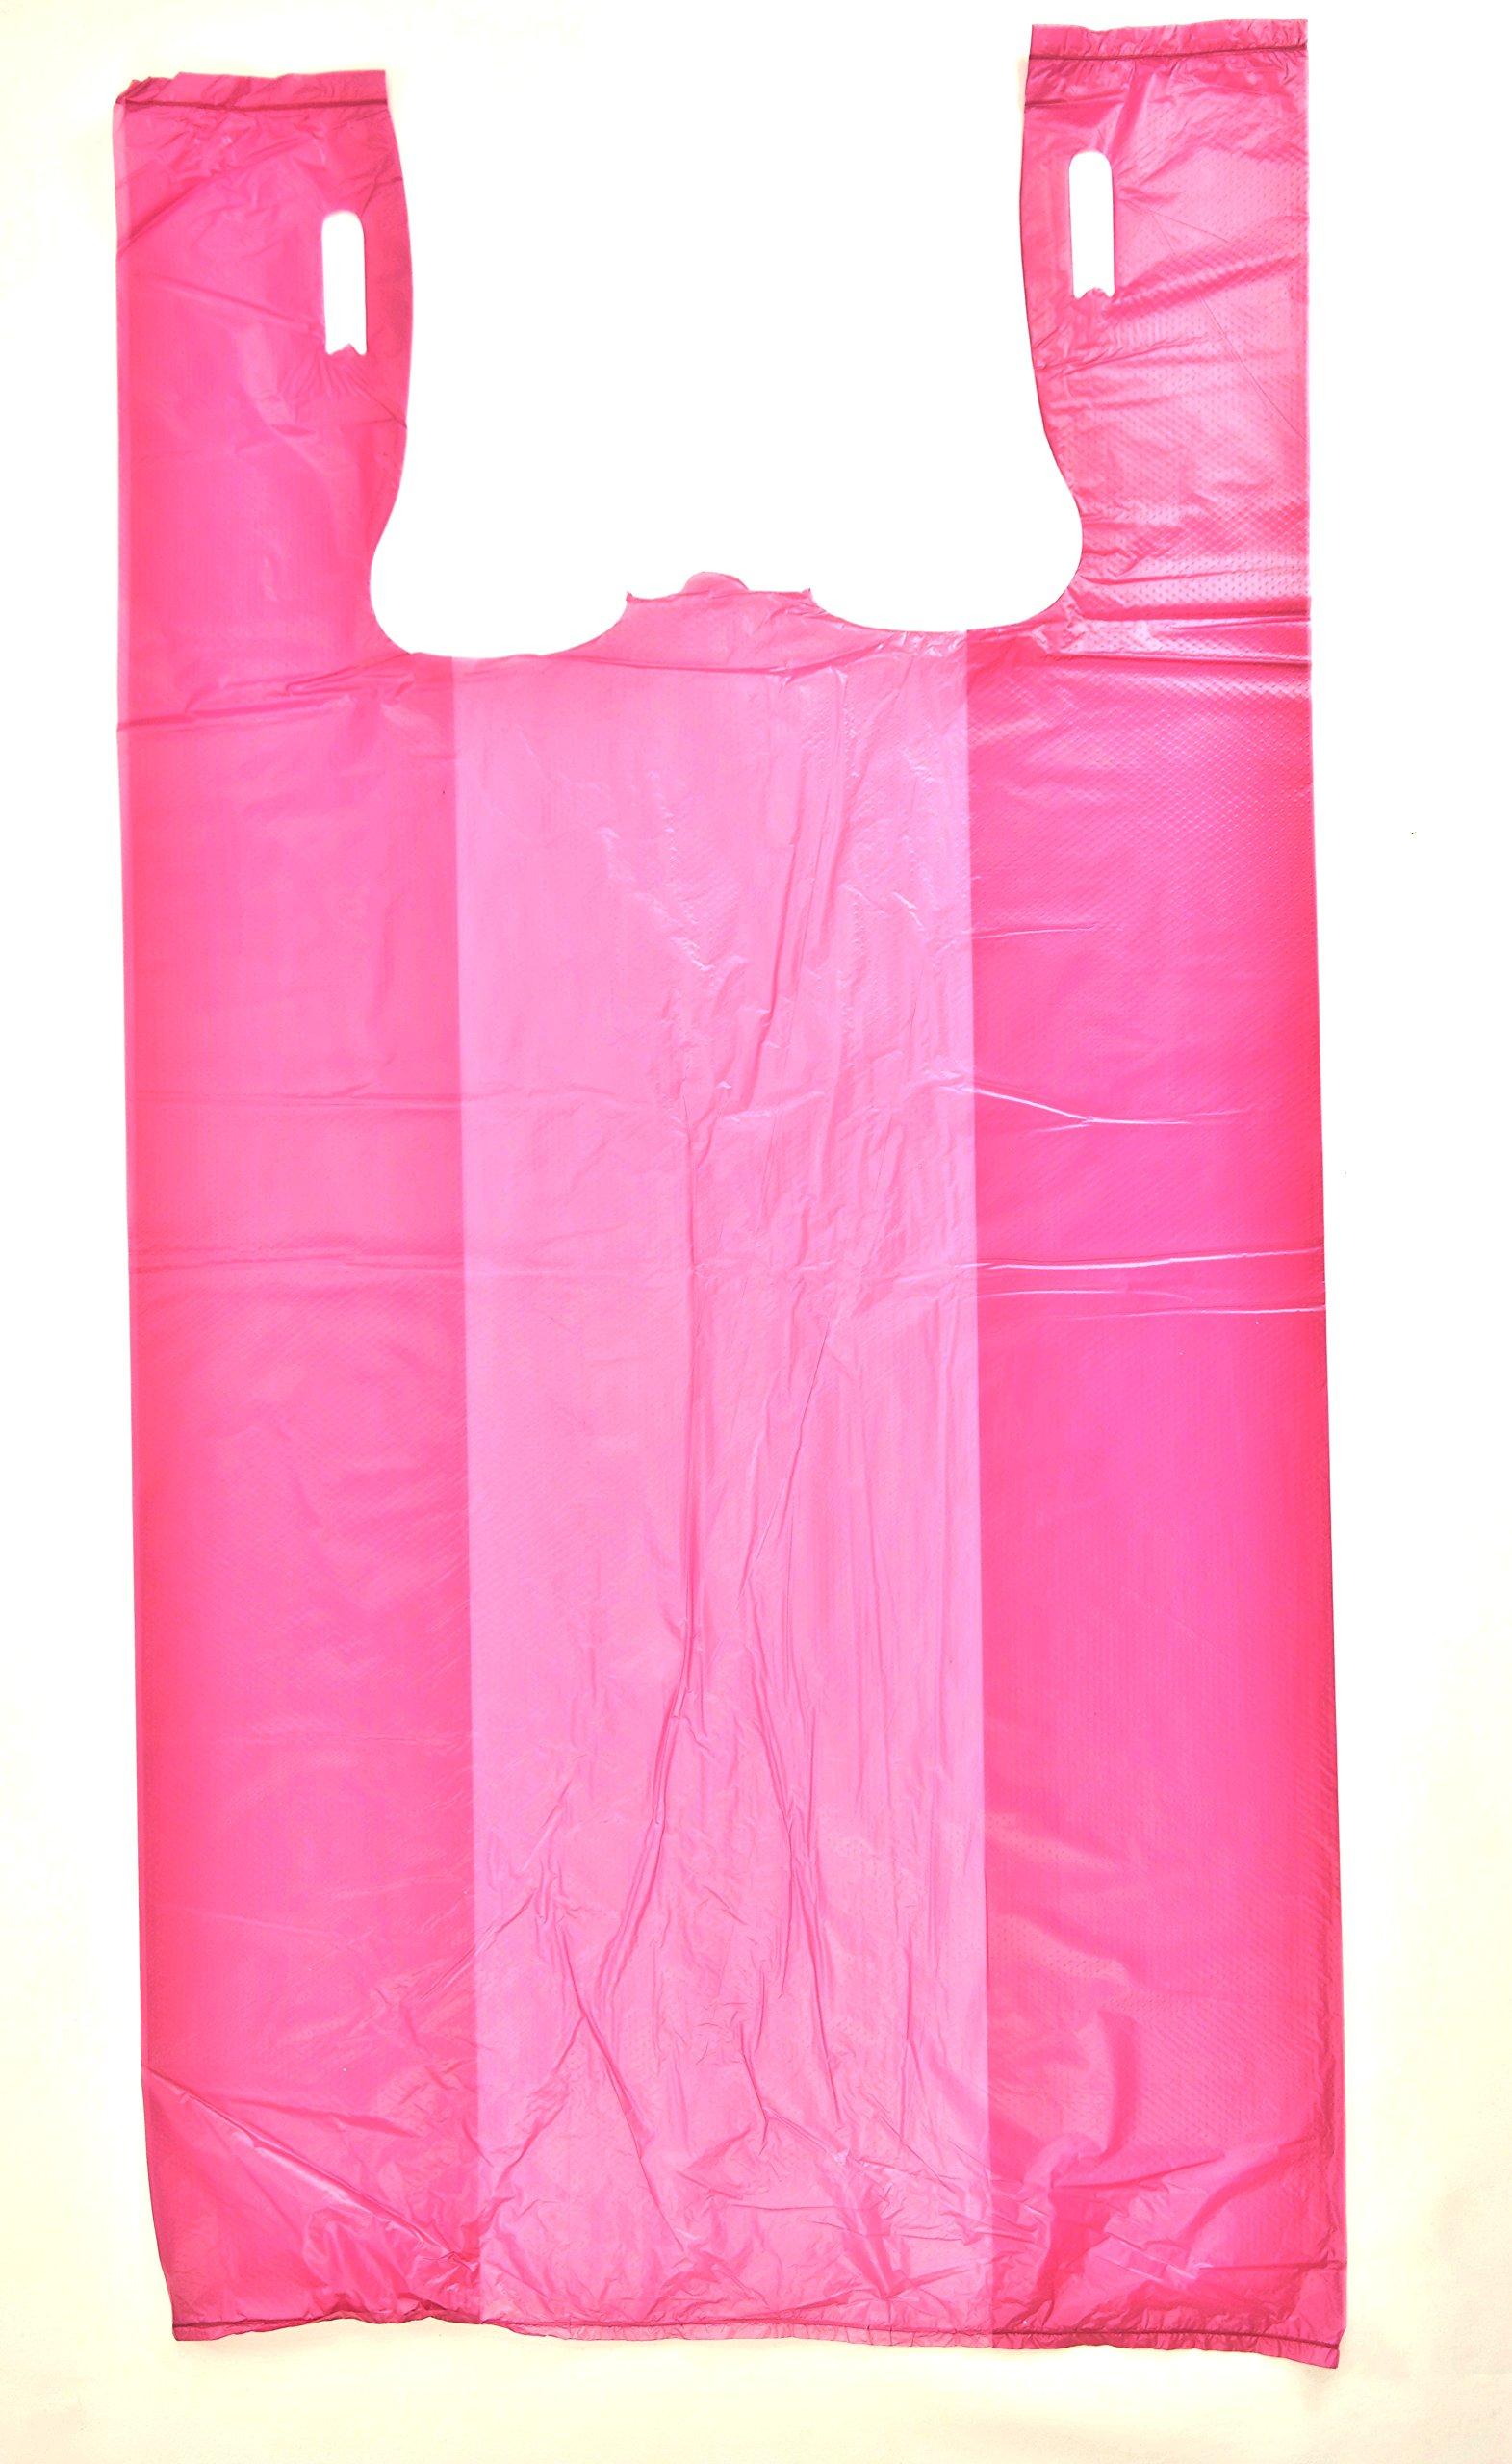 Plastic Bag Plain Embossed T-Shirt Bag 11.5''x6.5''x 21.5'' 13 mic - 1000 bags/case (6000, Burgandy)